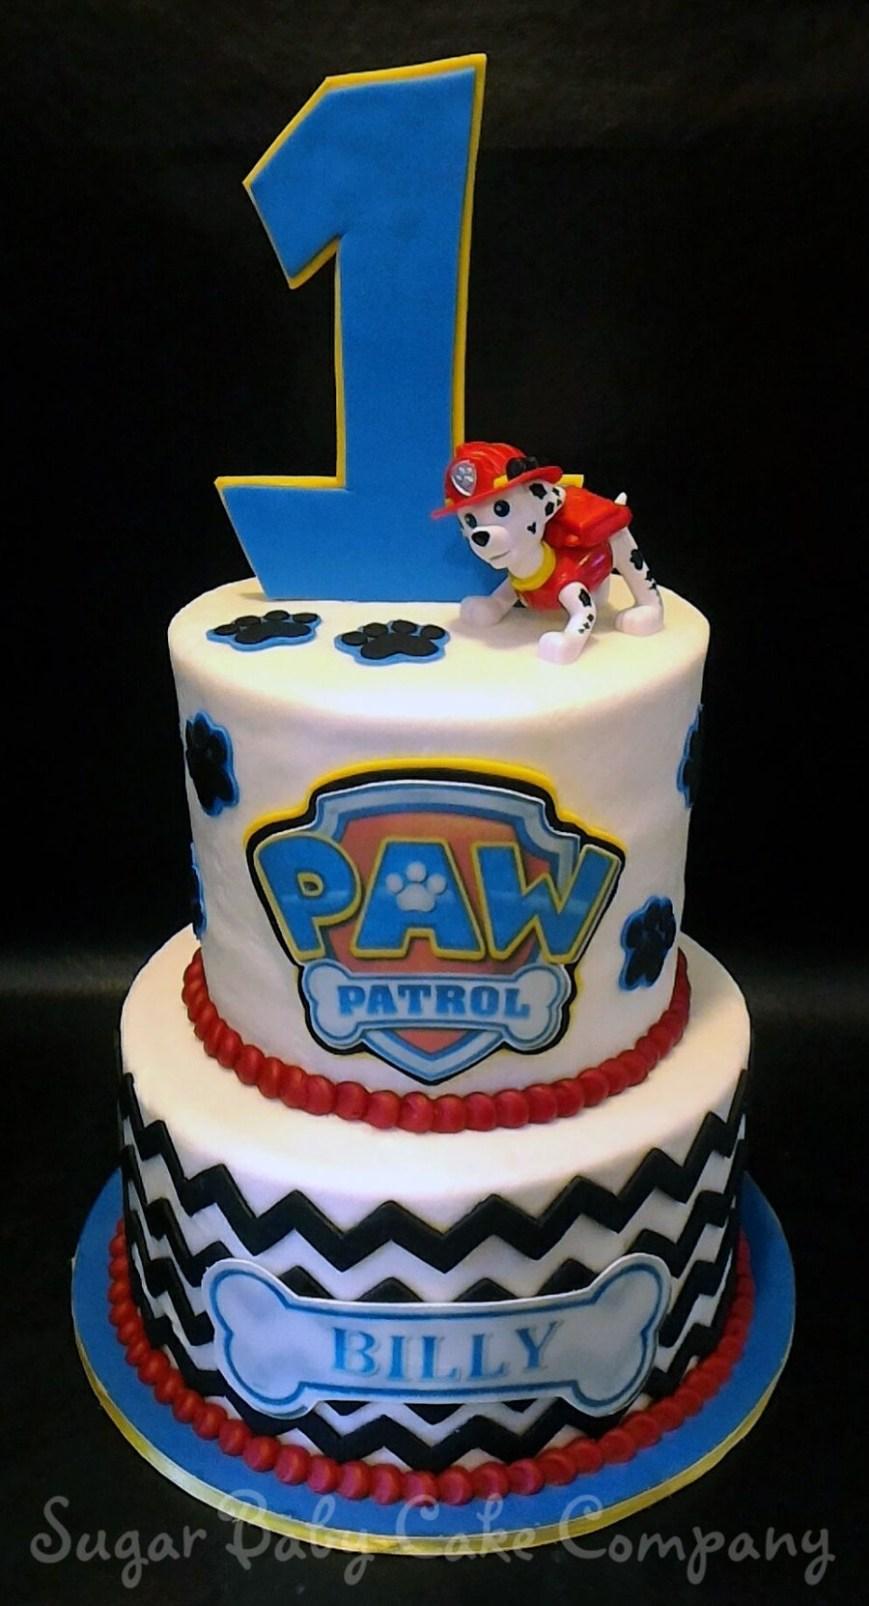 Paw Patrol Birthday Cake Ideas Paw Patrol 1st Birthday Cake Cakecentral Within Birthday Cake Ideas